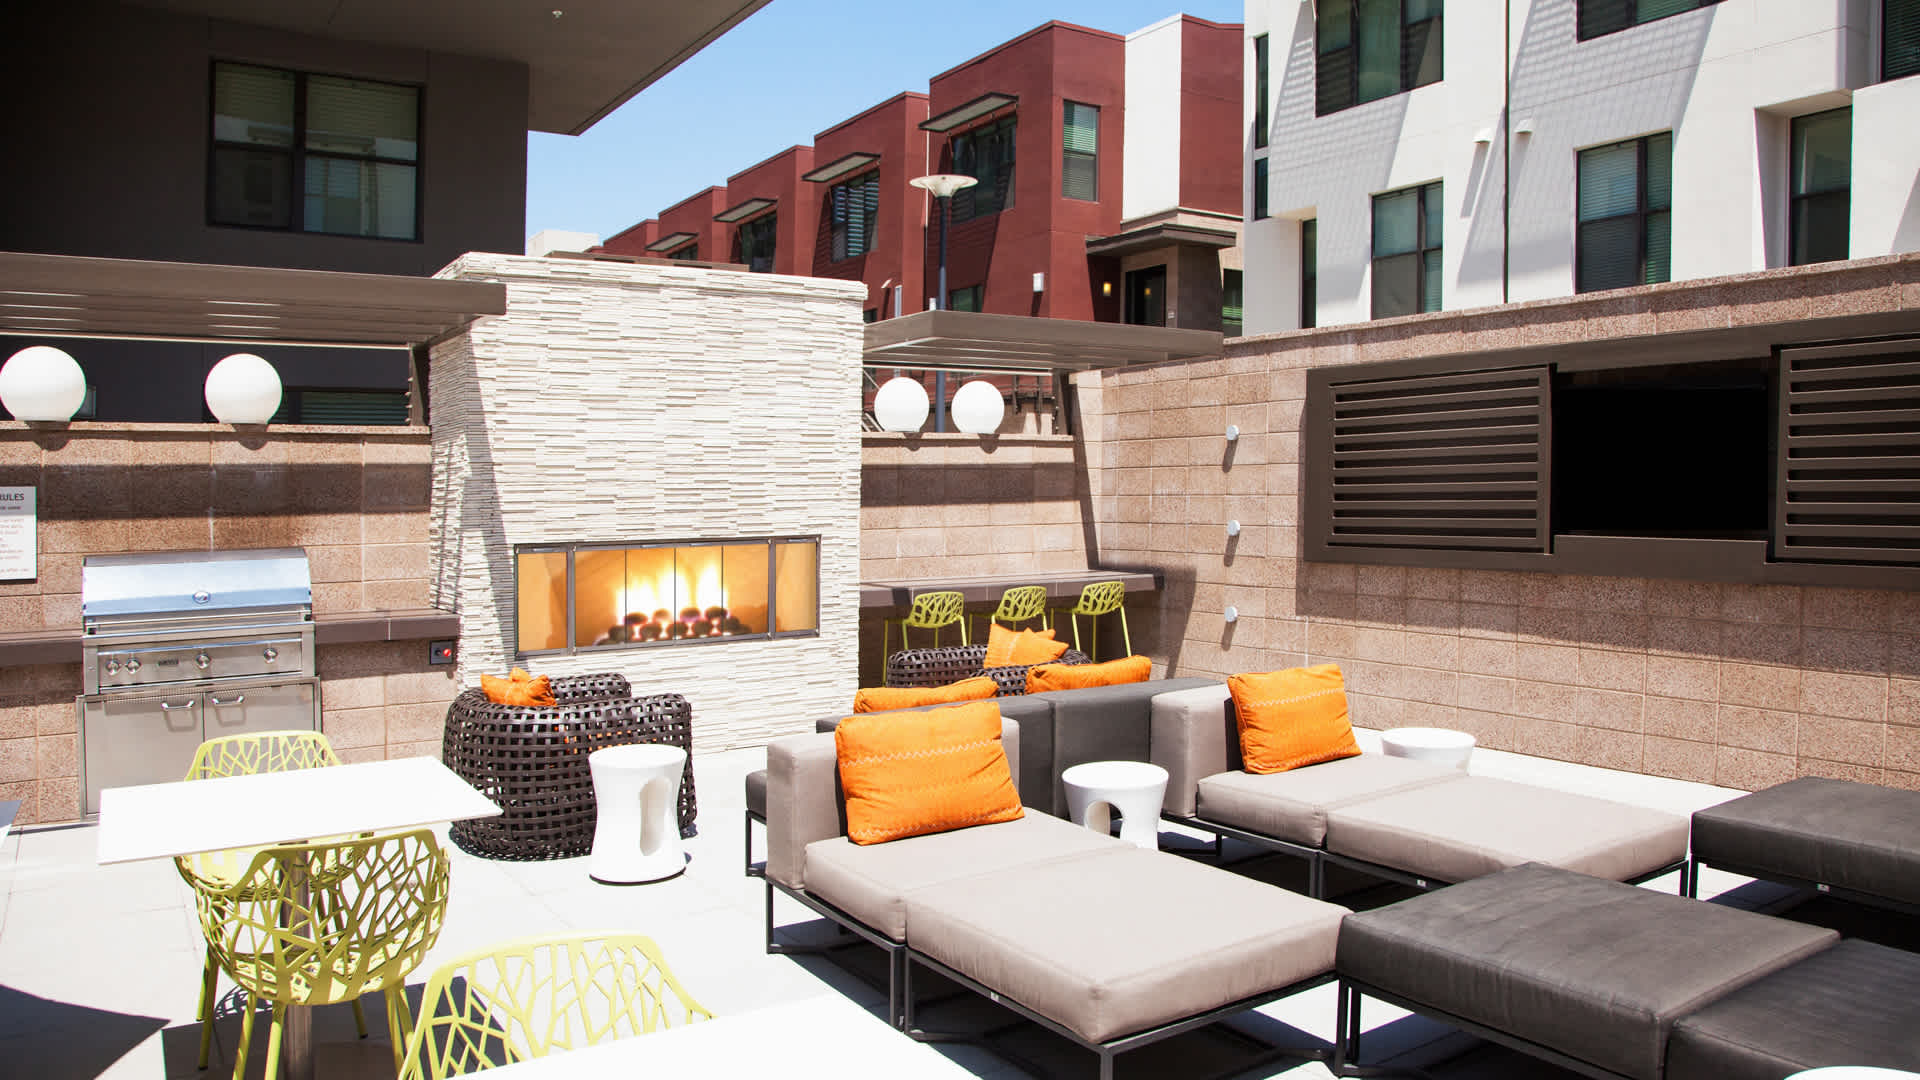 residences at westgate apartments reviews in old town pasadena